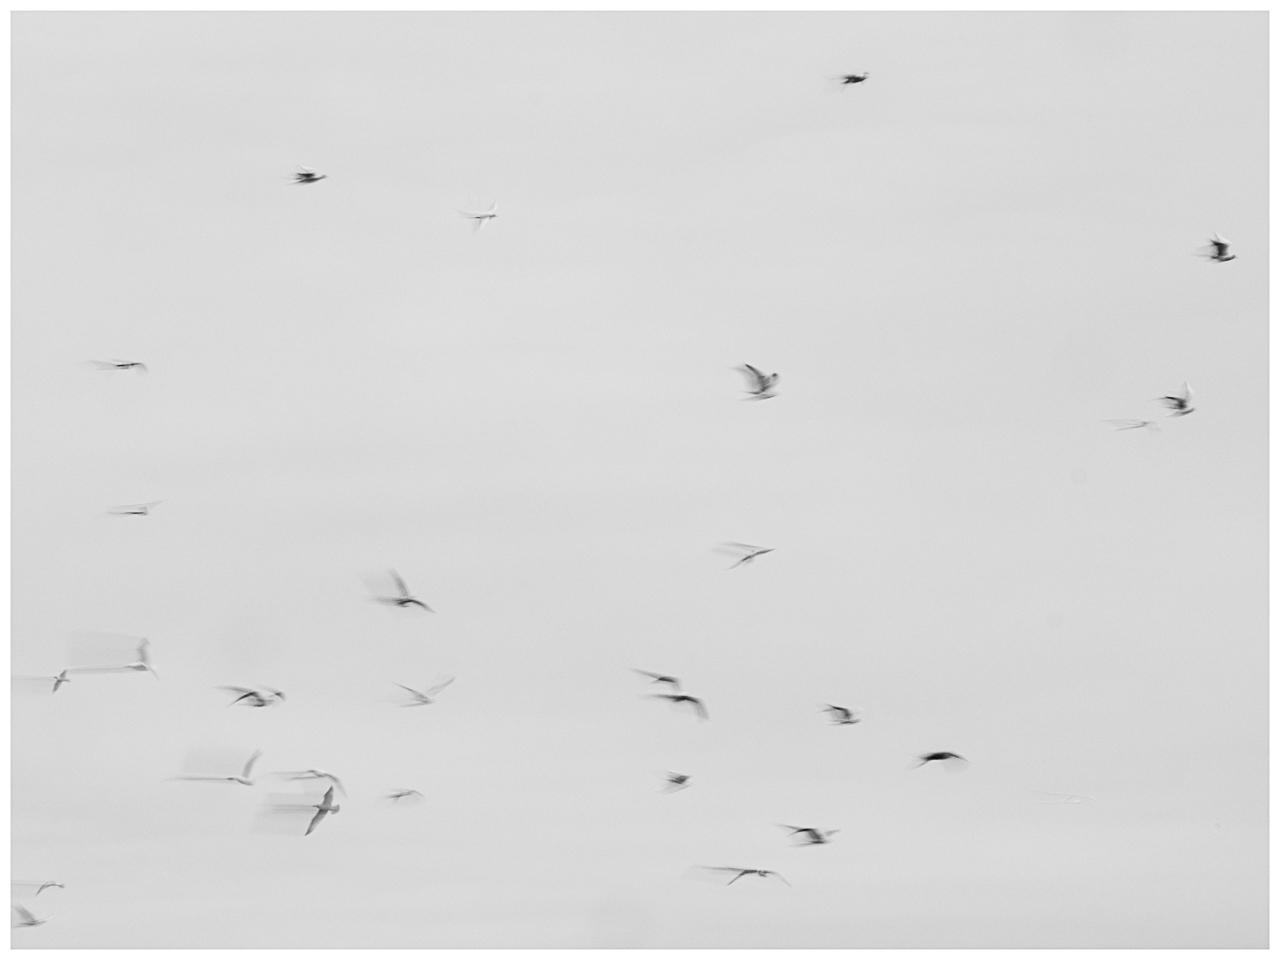 Blankenfelde III. Birding Arkenberge